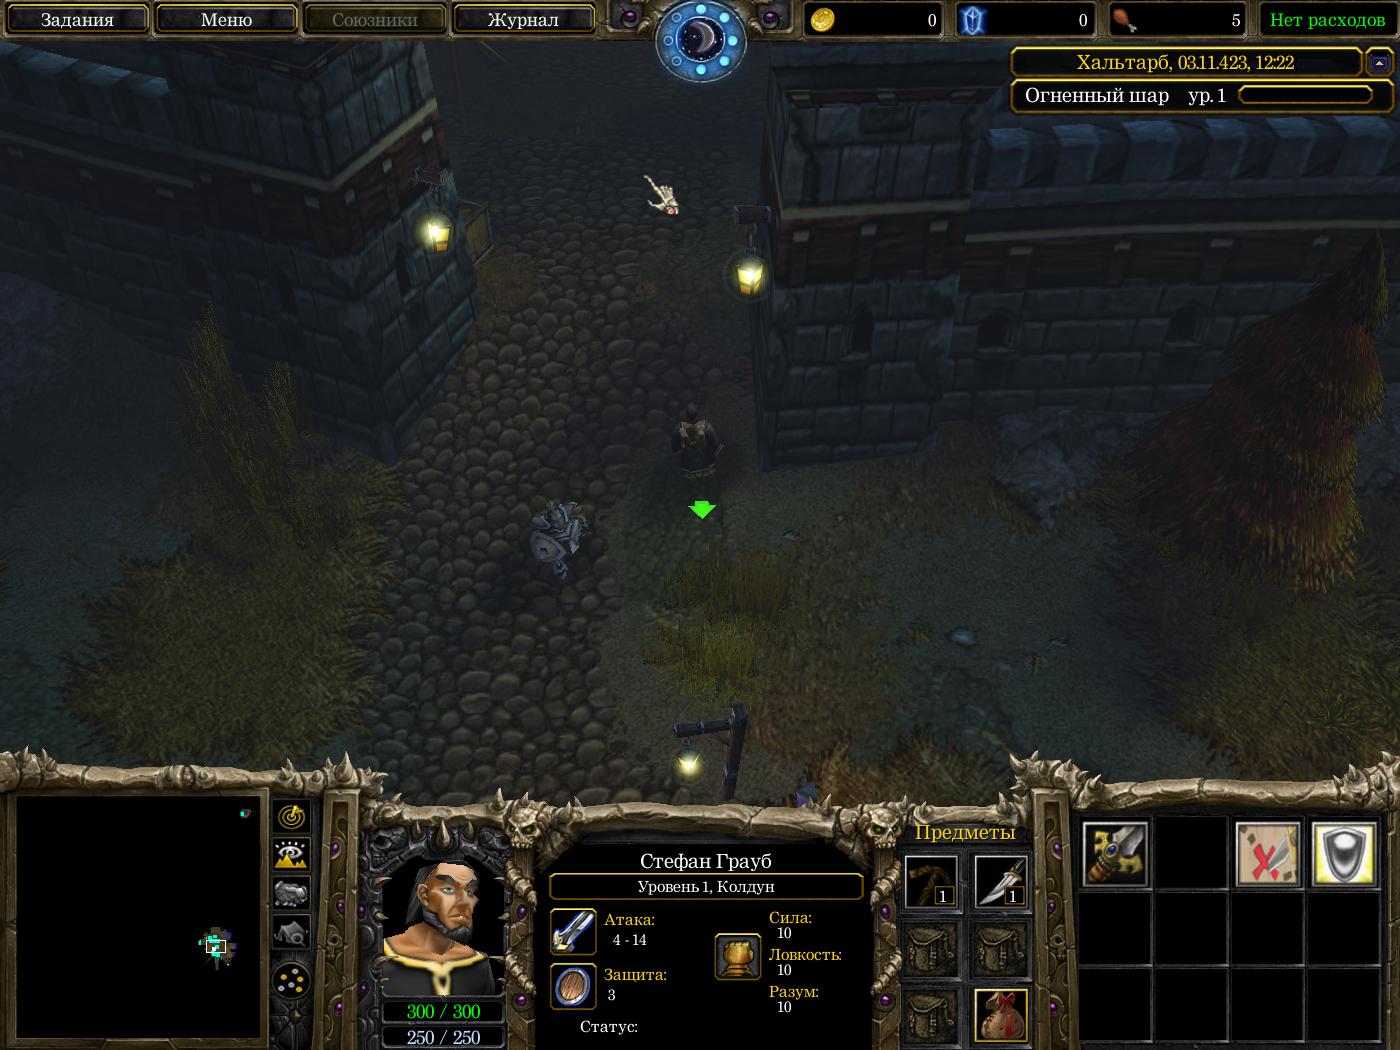 http://xgm.guru/p/wizard/green-arrow